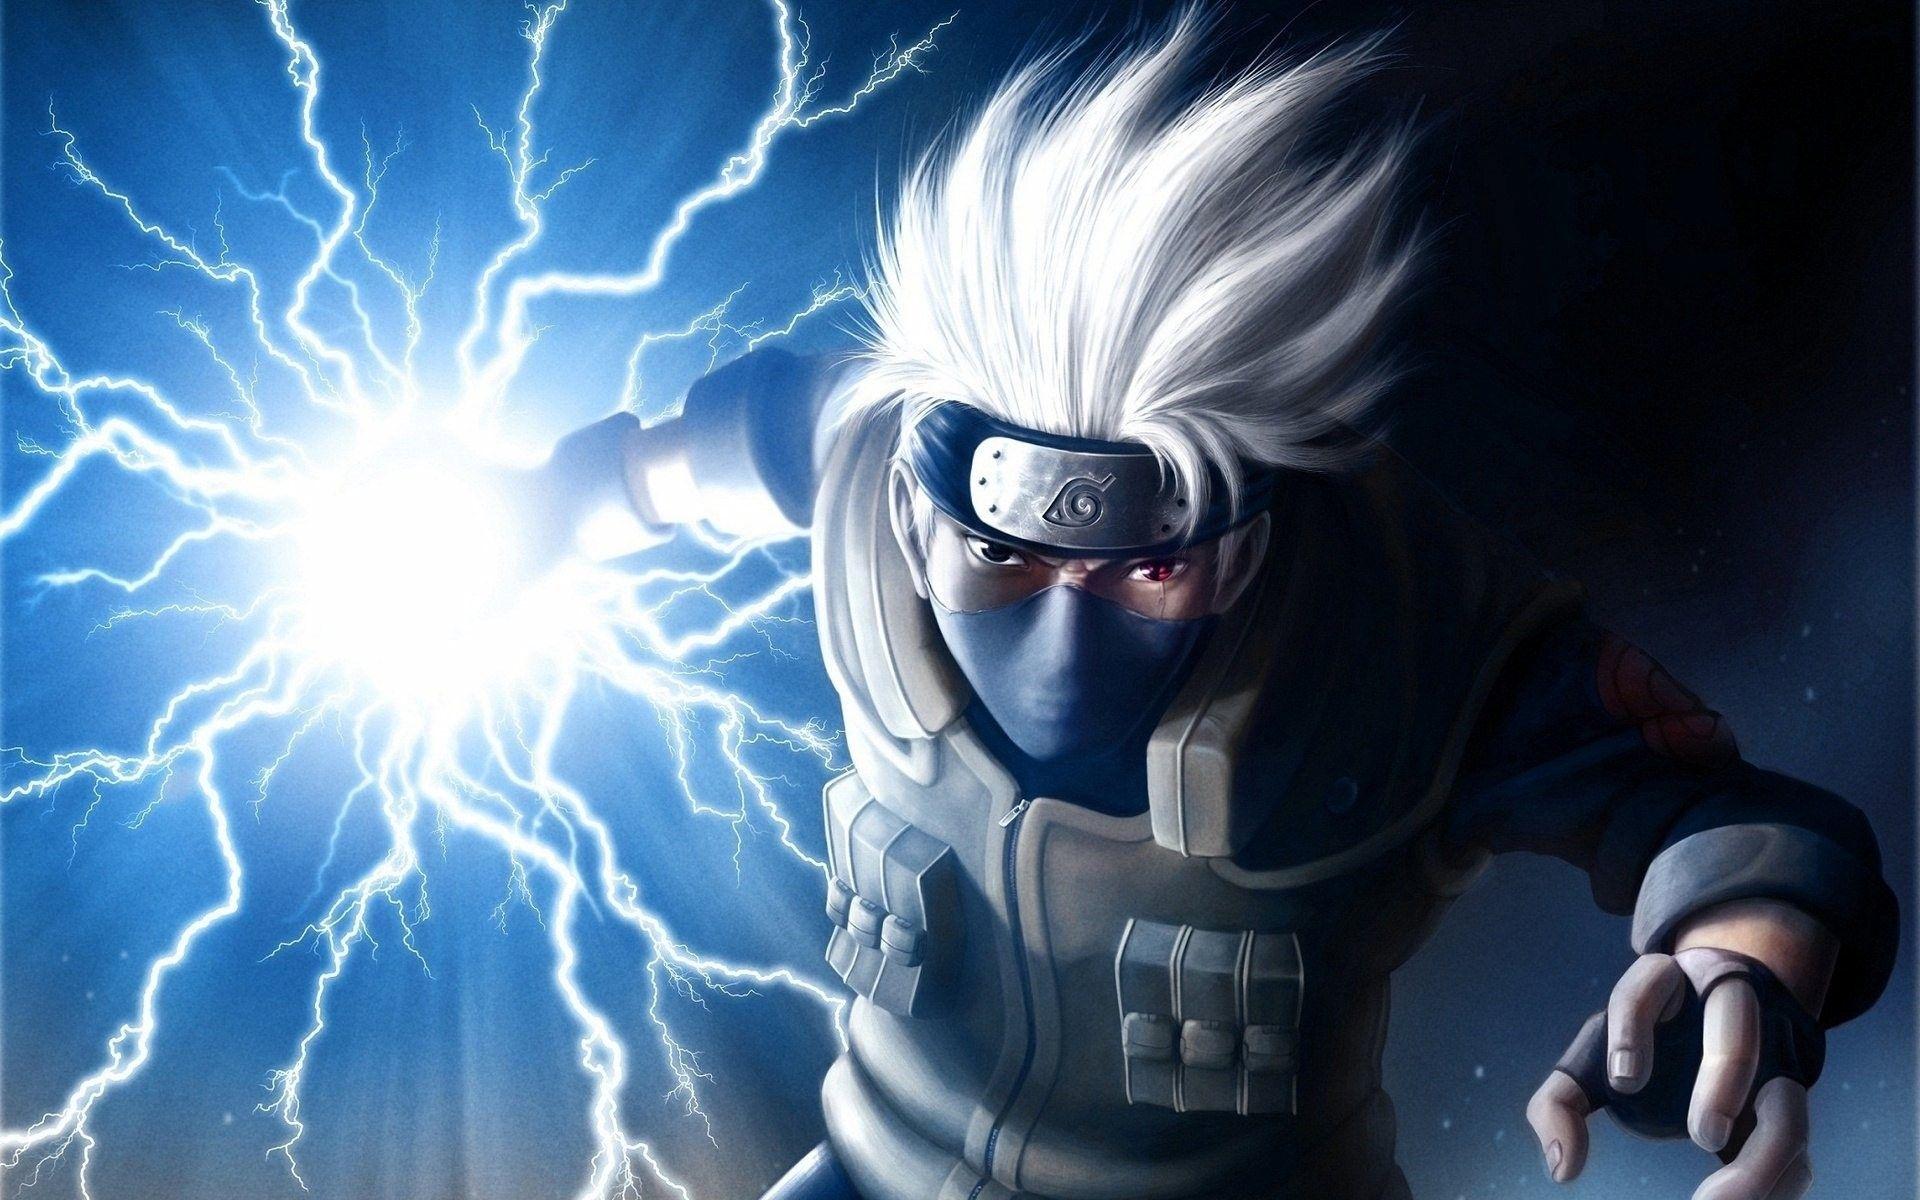 Naruto hd, Desktop Wallpaper